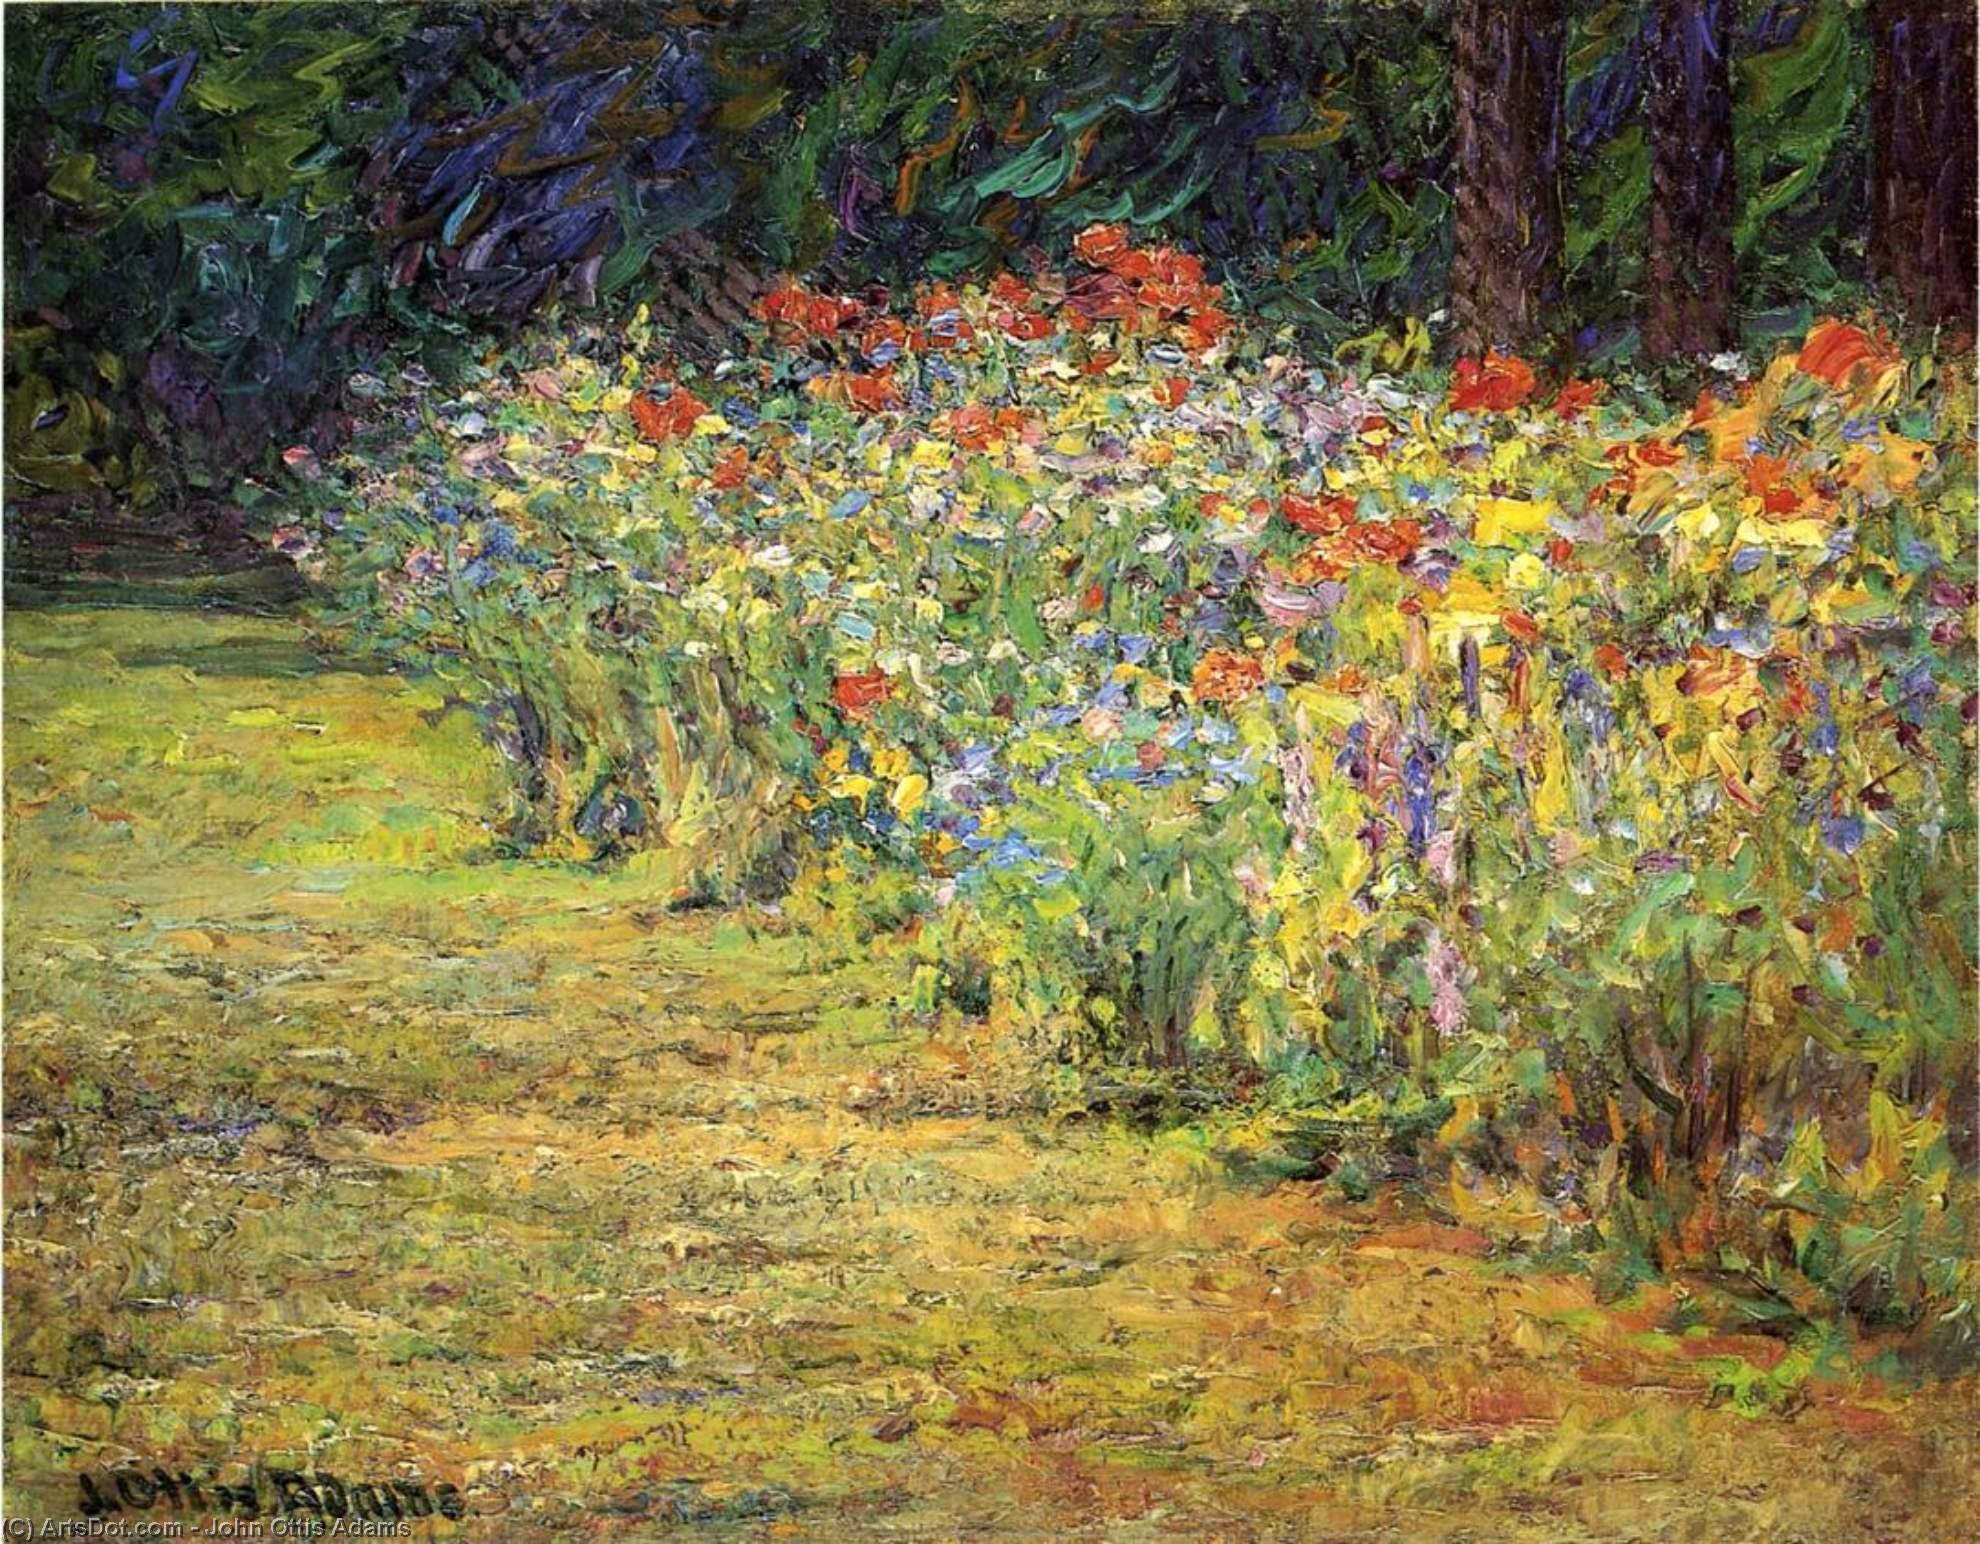 Wikioo.org - The Encyclopedia of Fine Arts - Painting, Artwork by John Ottis Adams - Flower Border